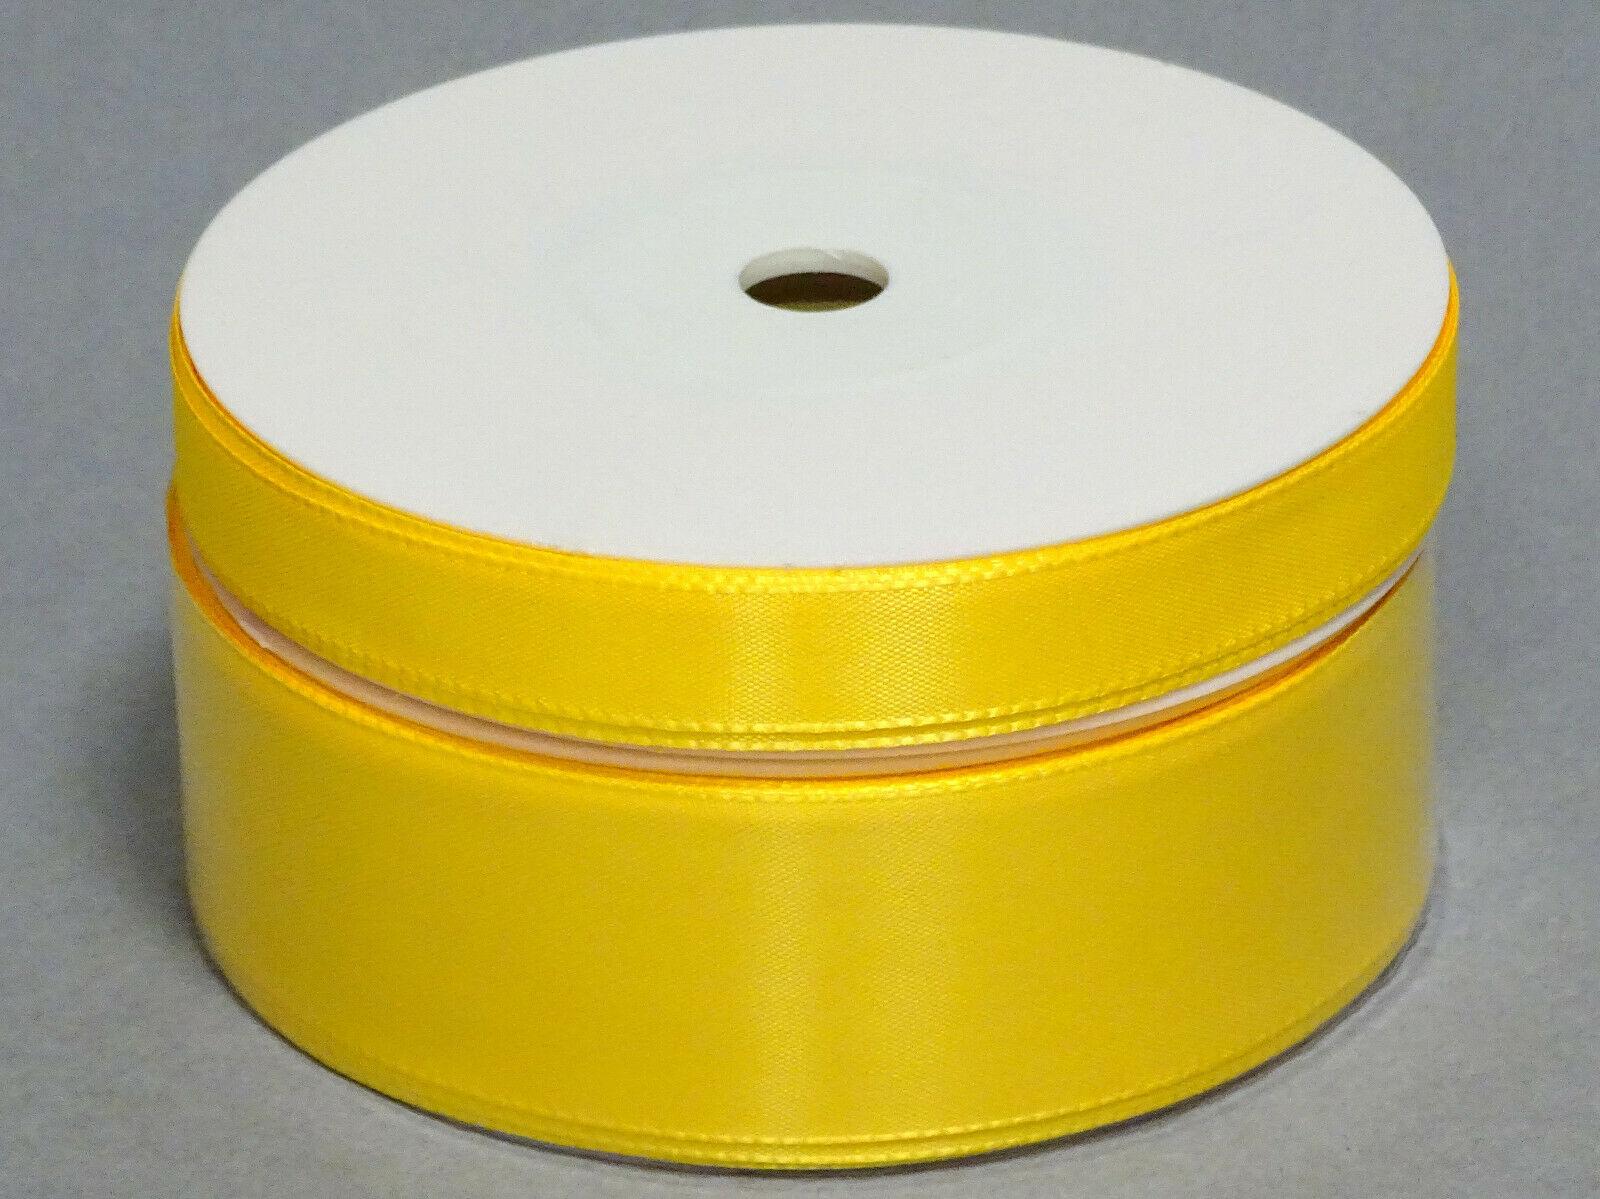 Seidenband Schleifenband 50 m x 15 / 25 / 40mm Dekoband ab 0,08€/m Geschenkband  - Gelb 245, 15 mm x 50 m